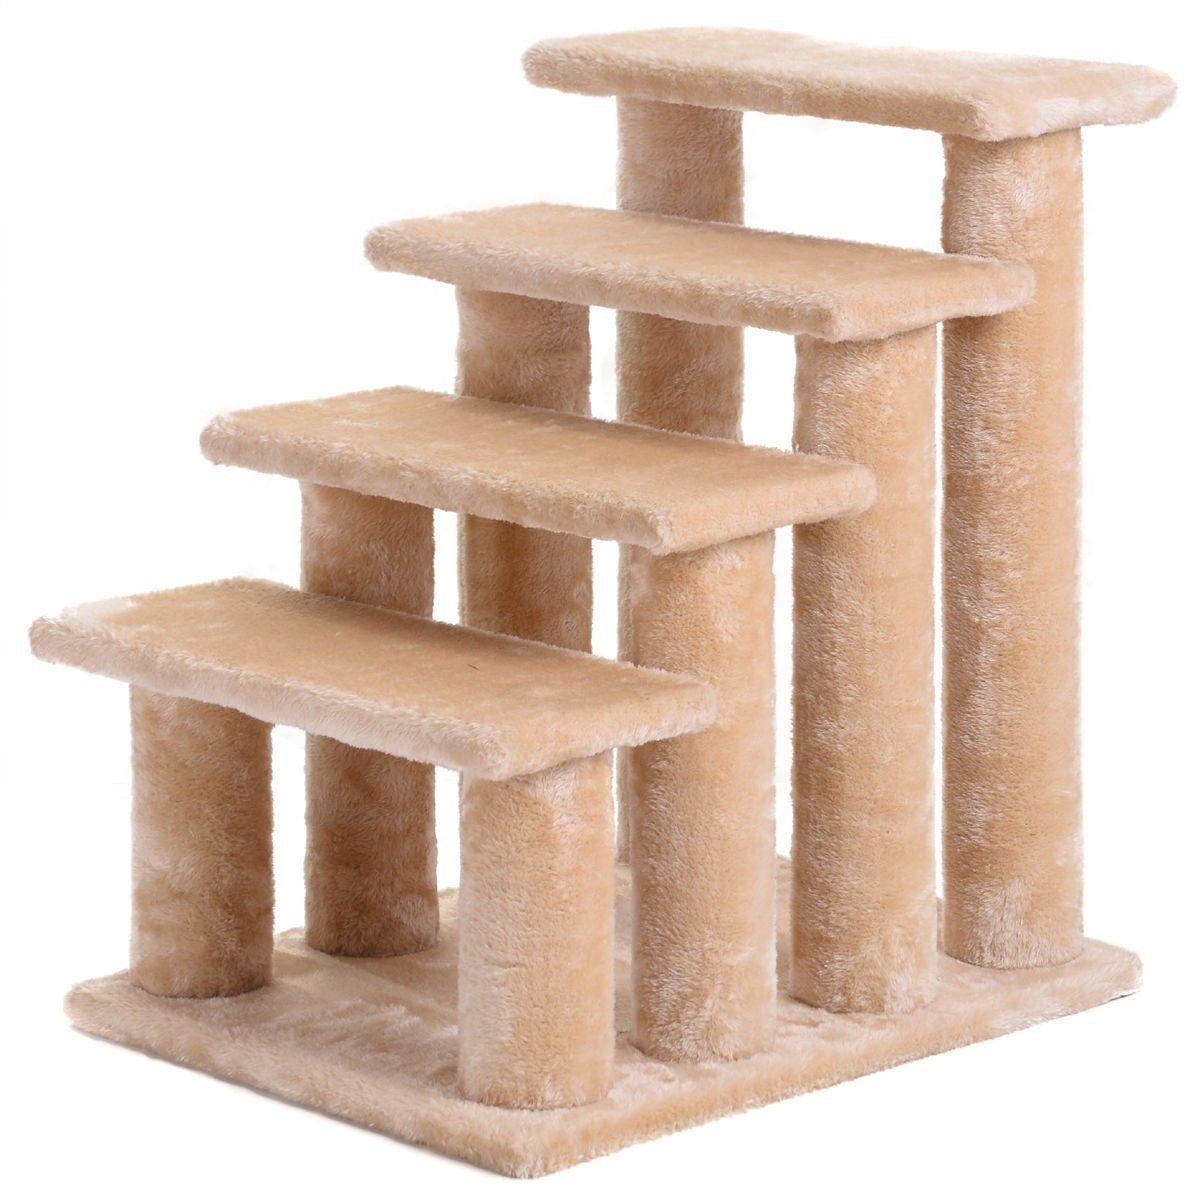 EE 21' Cat Tree 4Step Stairway Perch Scratcher Stairs Dog